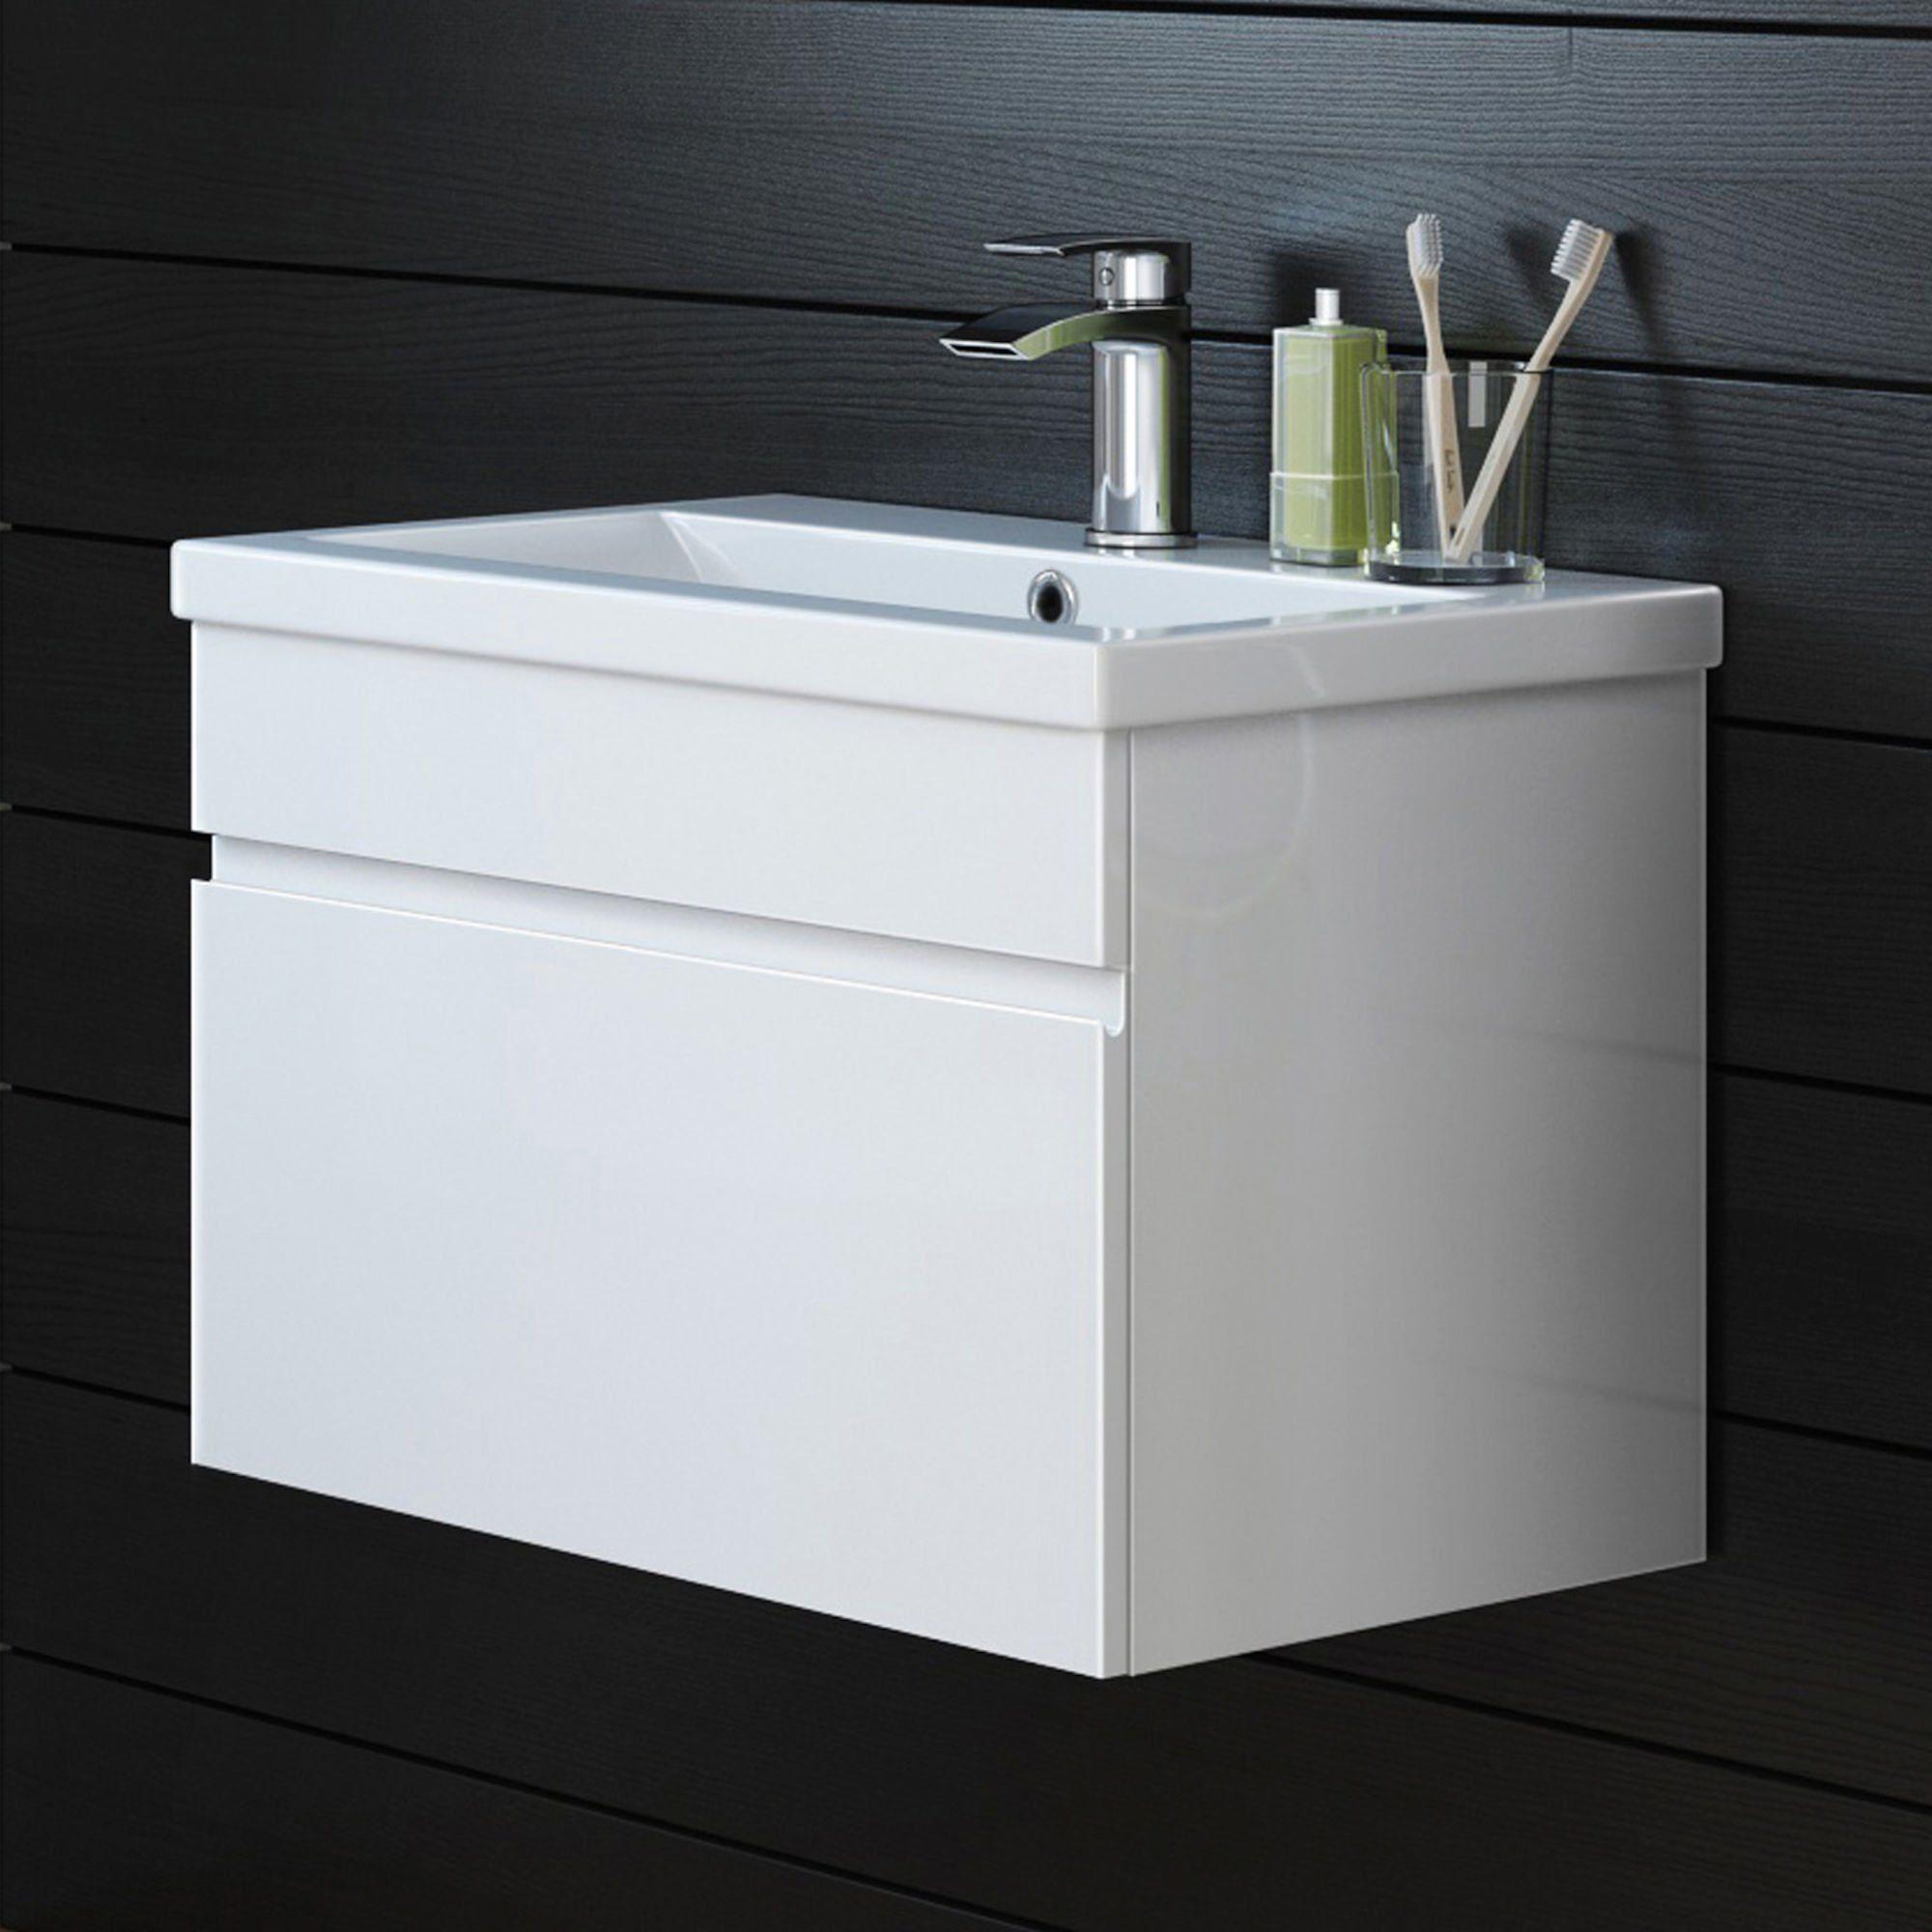 600mm Trent High Gloss White Basin Cabinet - Wall Hung   High gloss ...